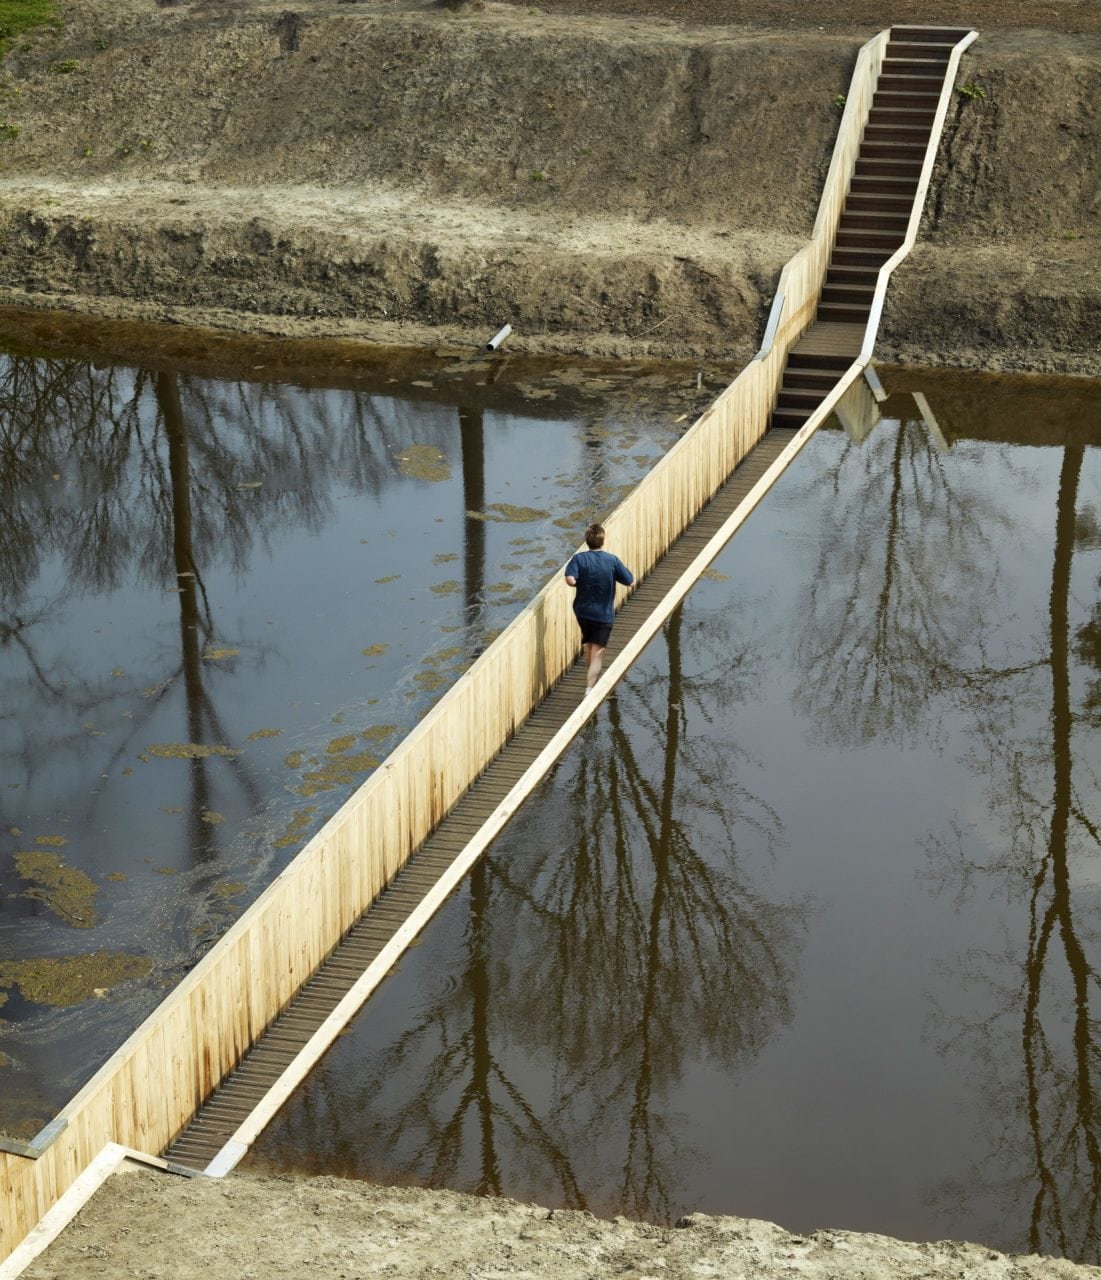 worlds best pedestrian bridges halsteren olanda - Cele mai frumoase poduri pietonale din lume